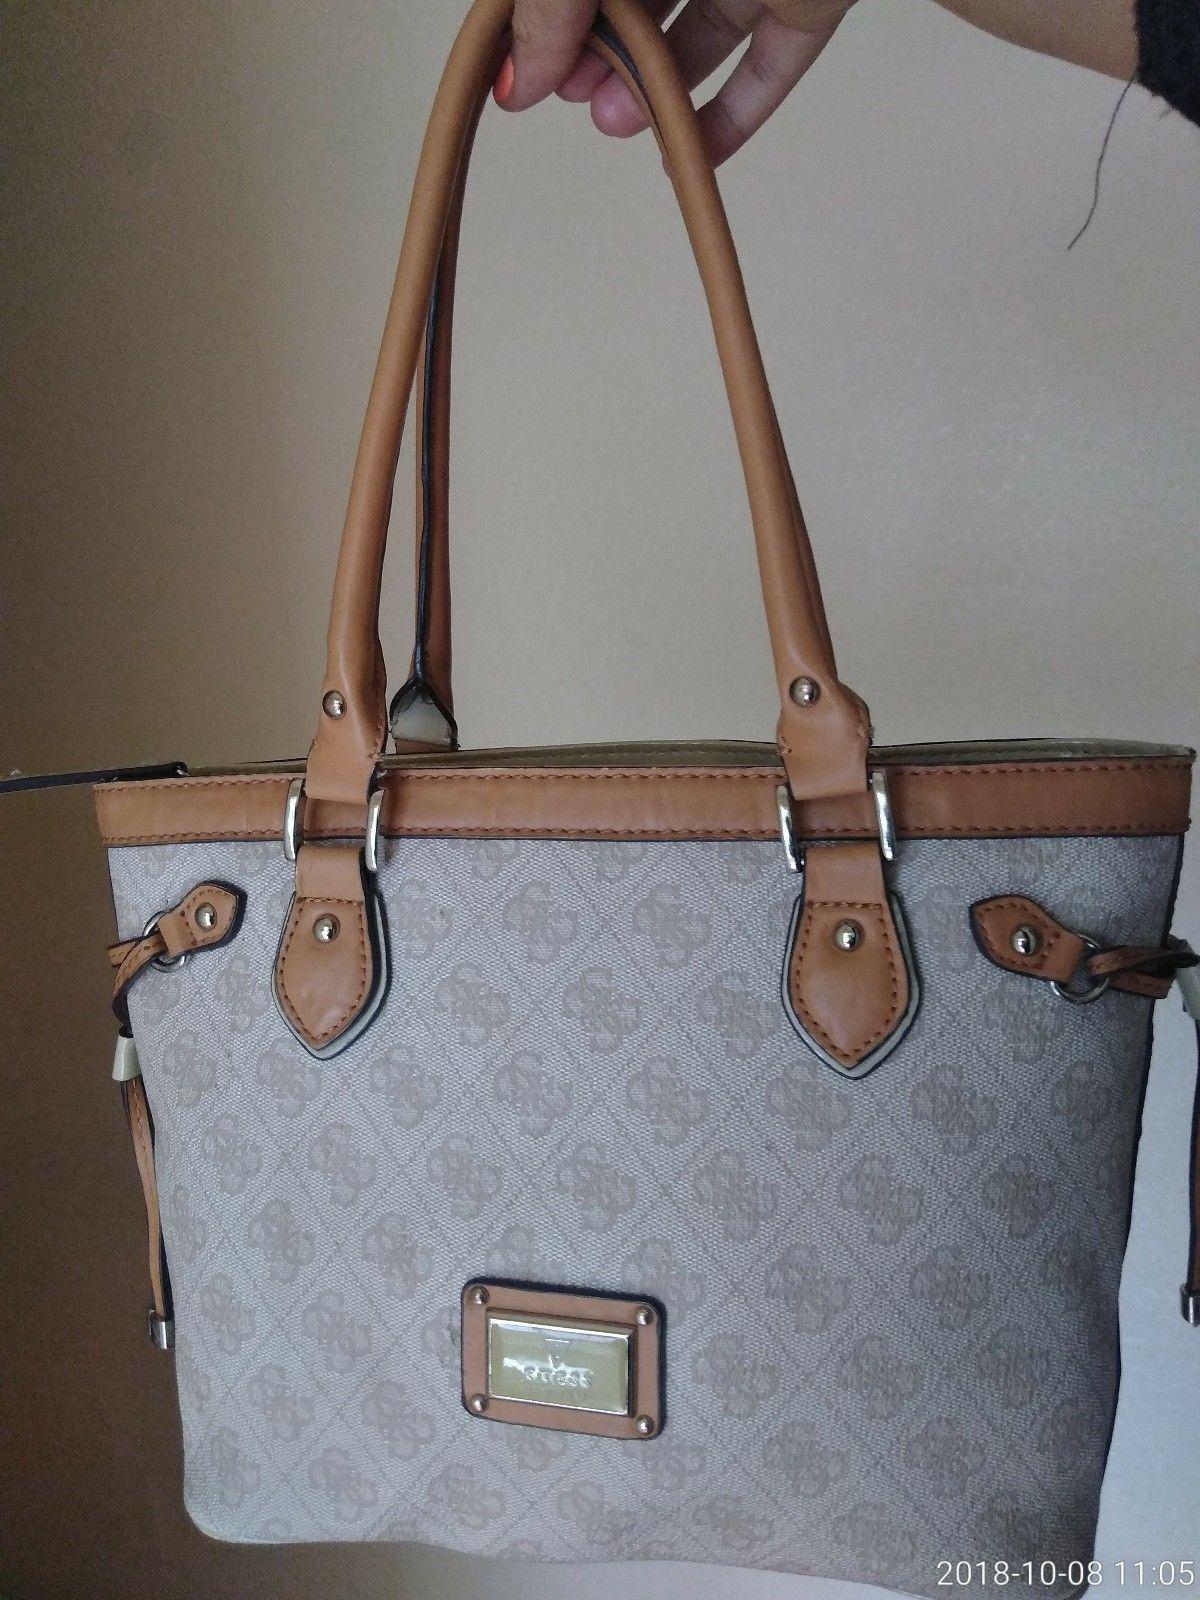 Guess Handbag Gently Used 7 49